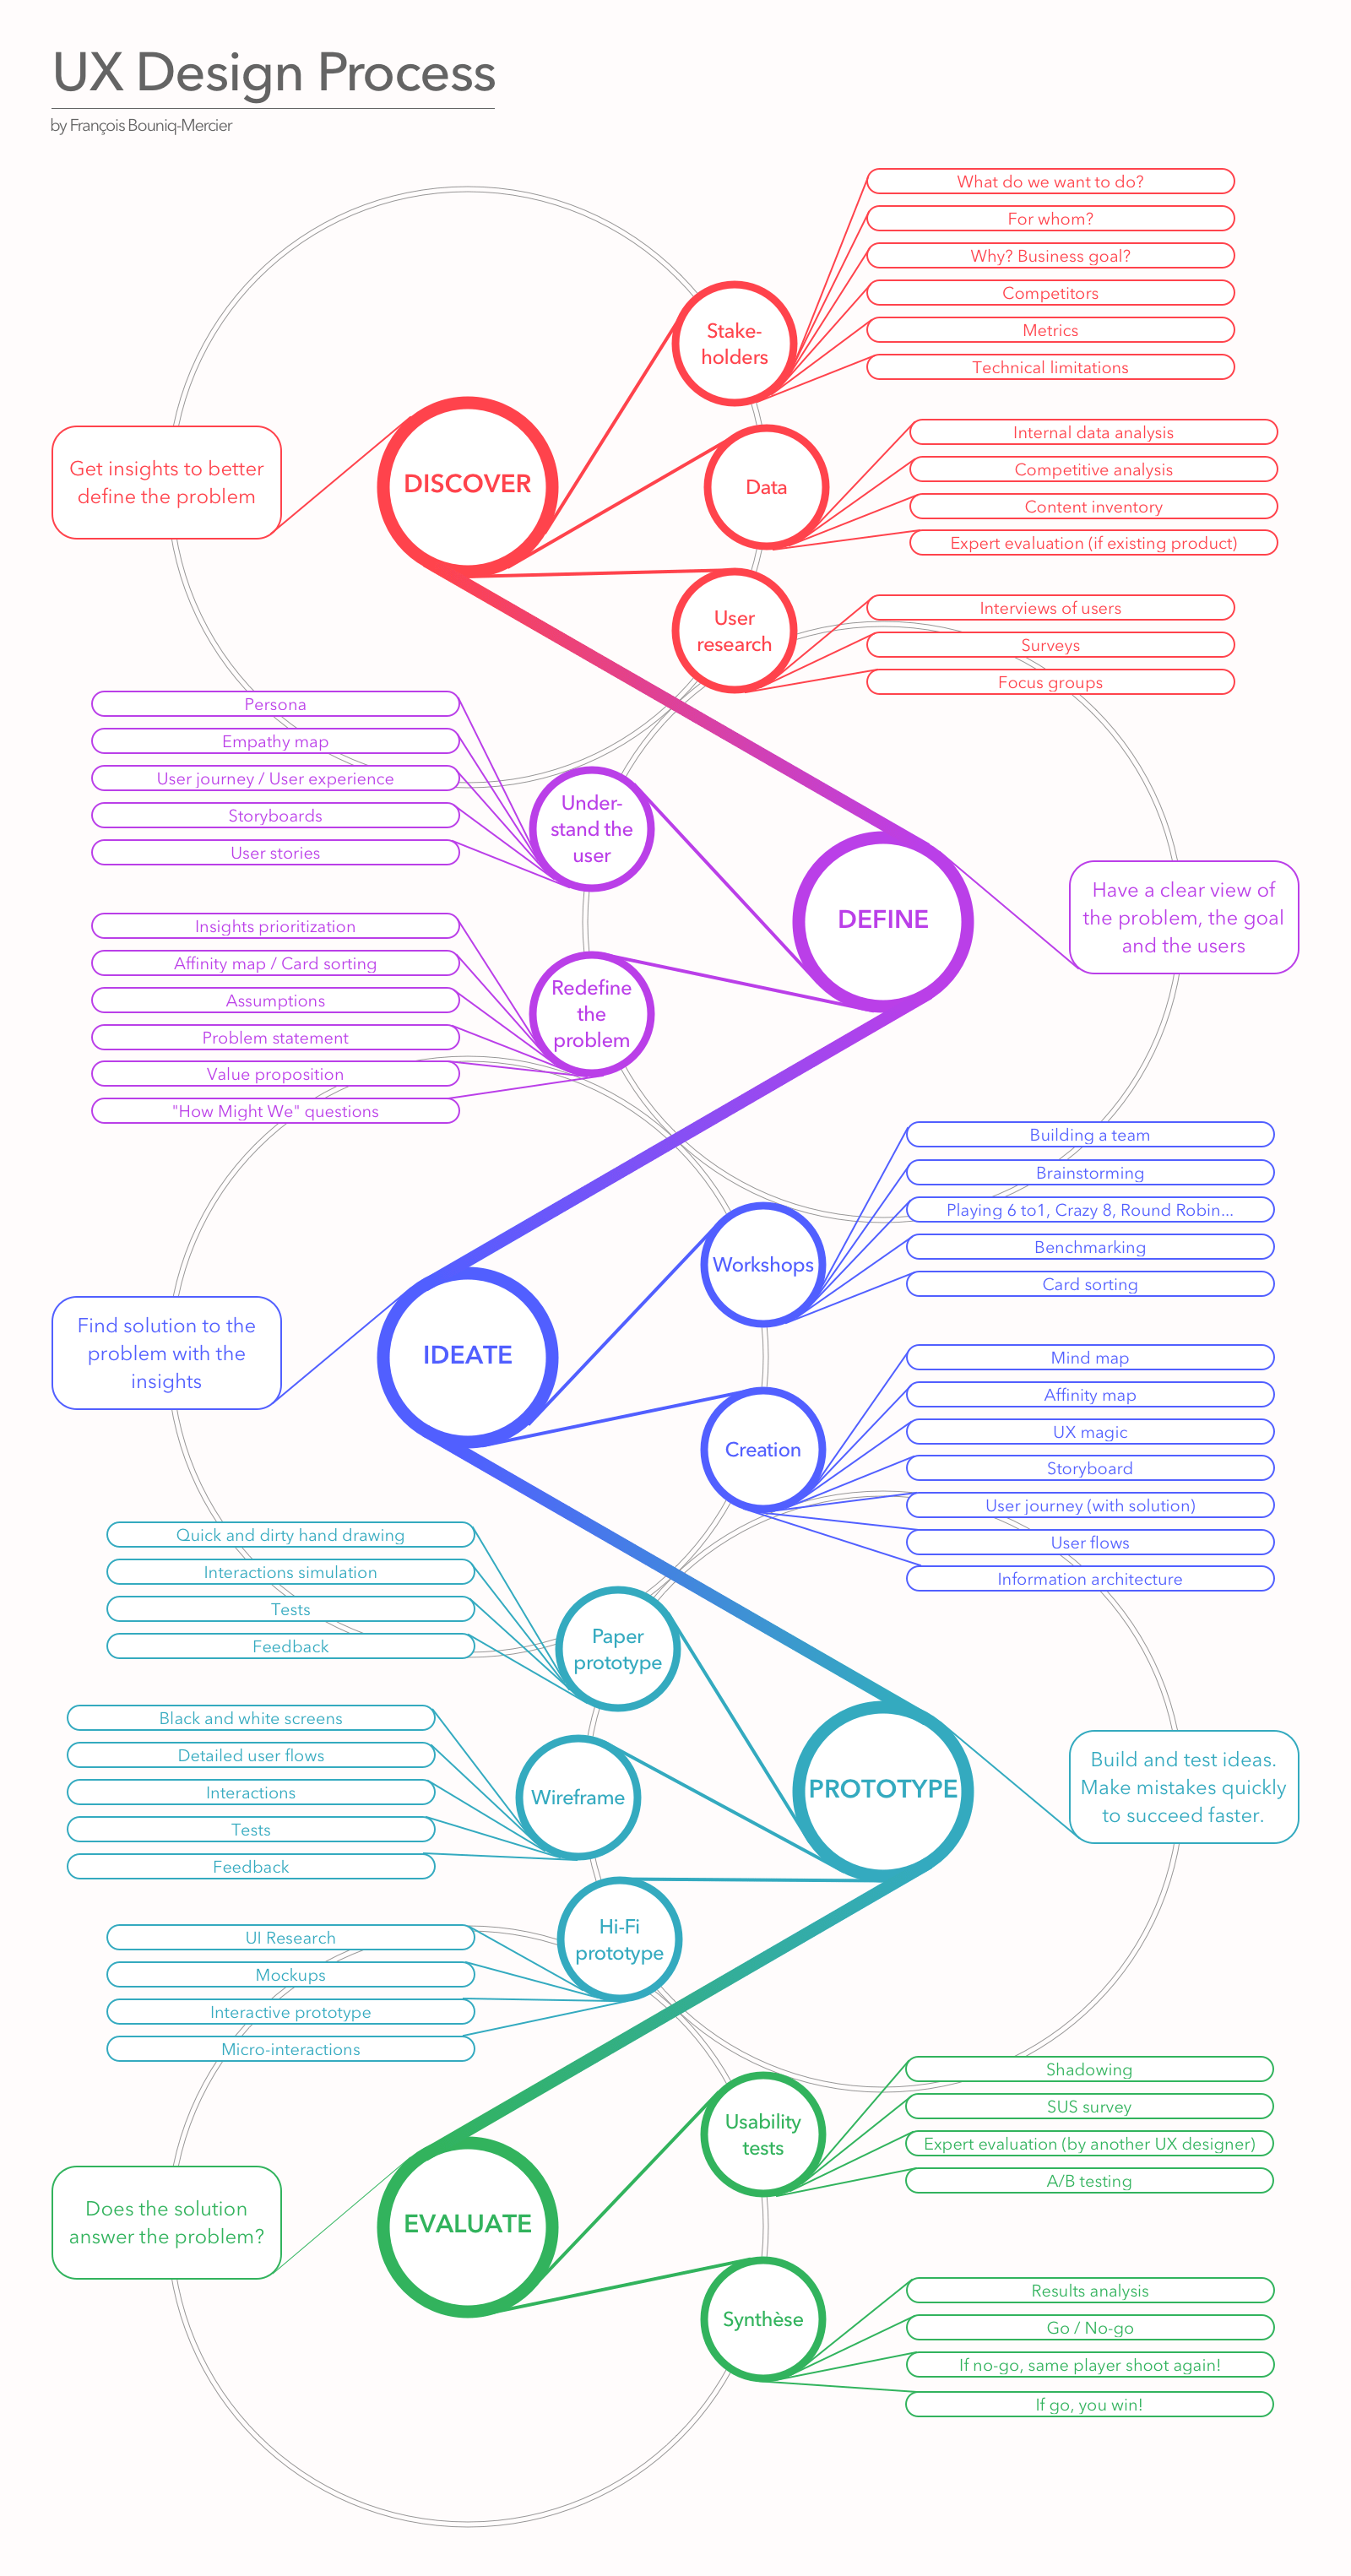 Download Hr Image At Uxdesign Ux Design Process Design Thinking Process Ux Design